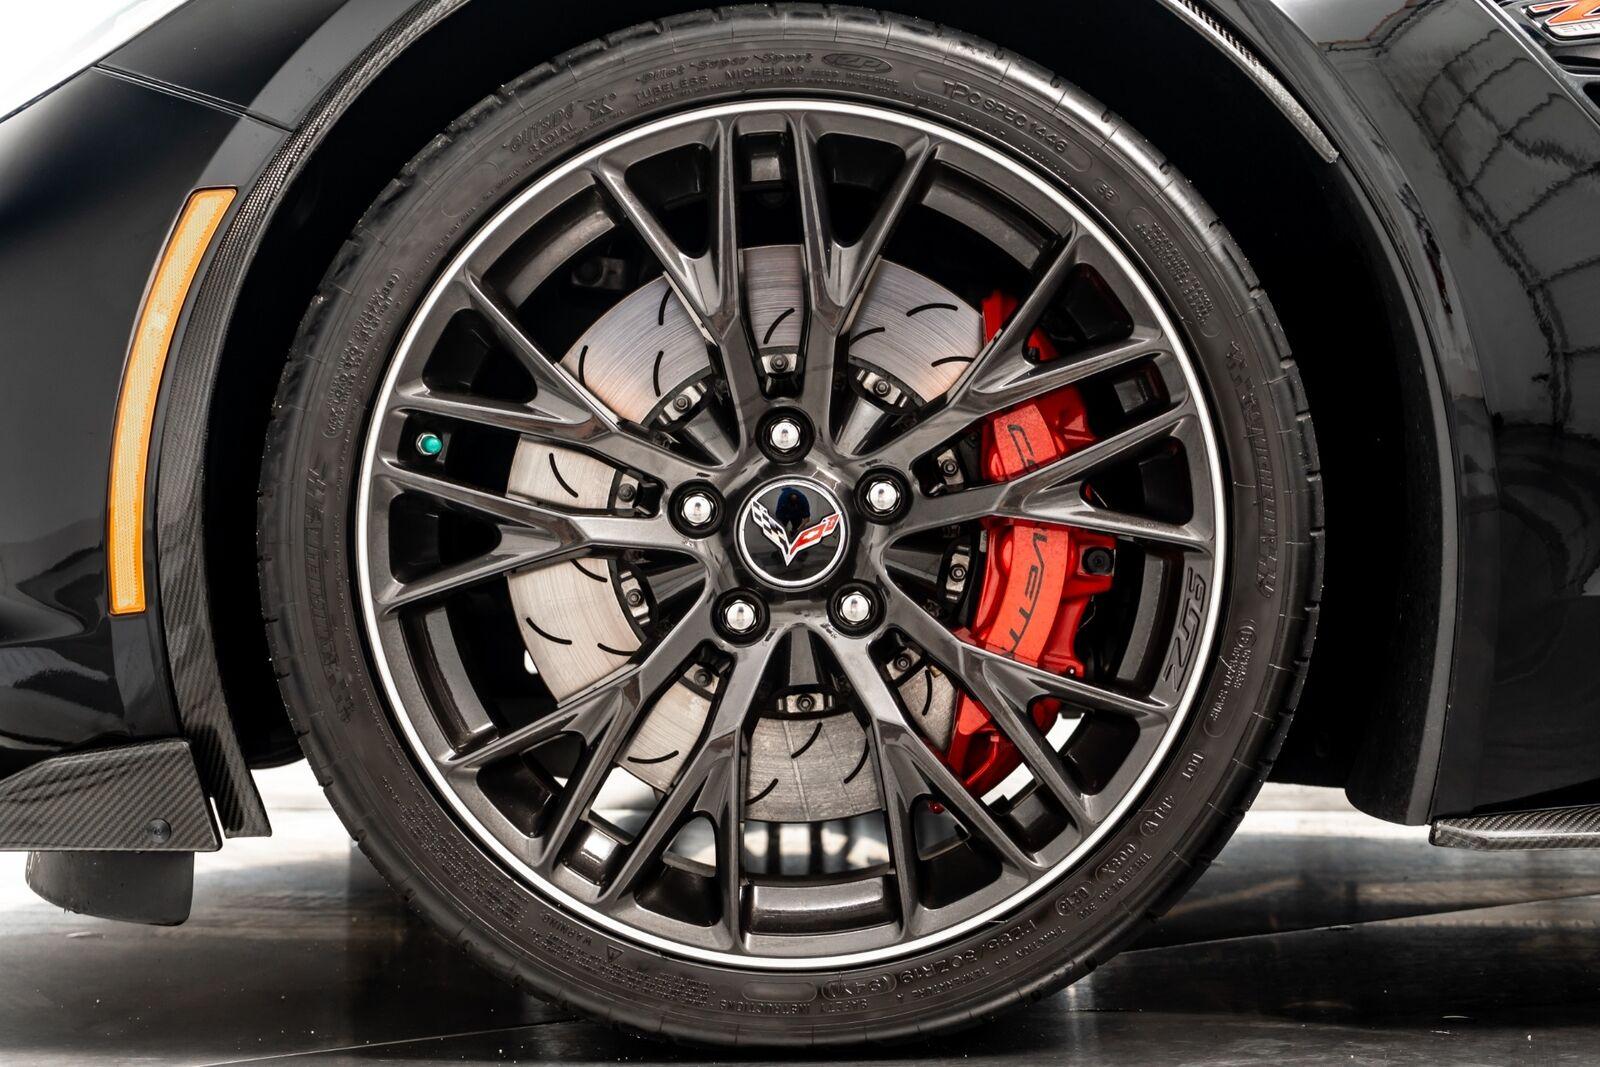 2015 Black Chevrolet Corvette Z06 3LZ   C7 Corvette Photo 9